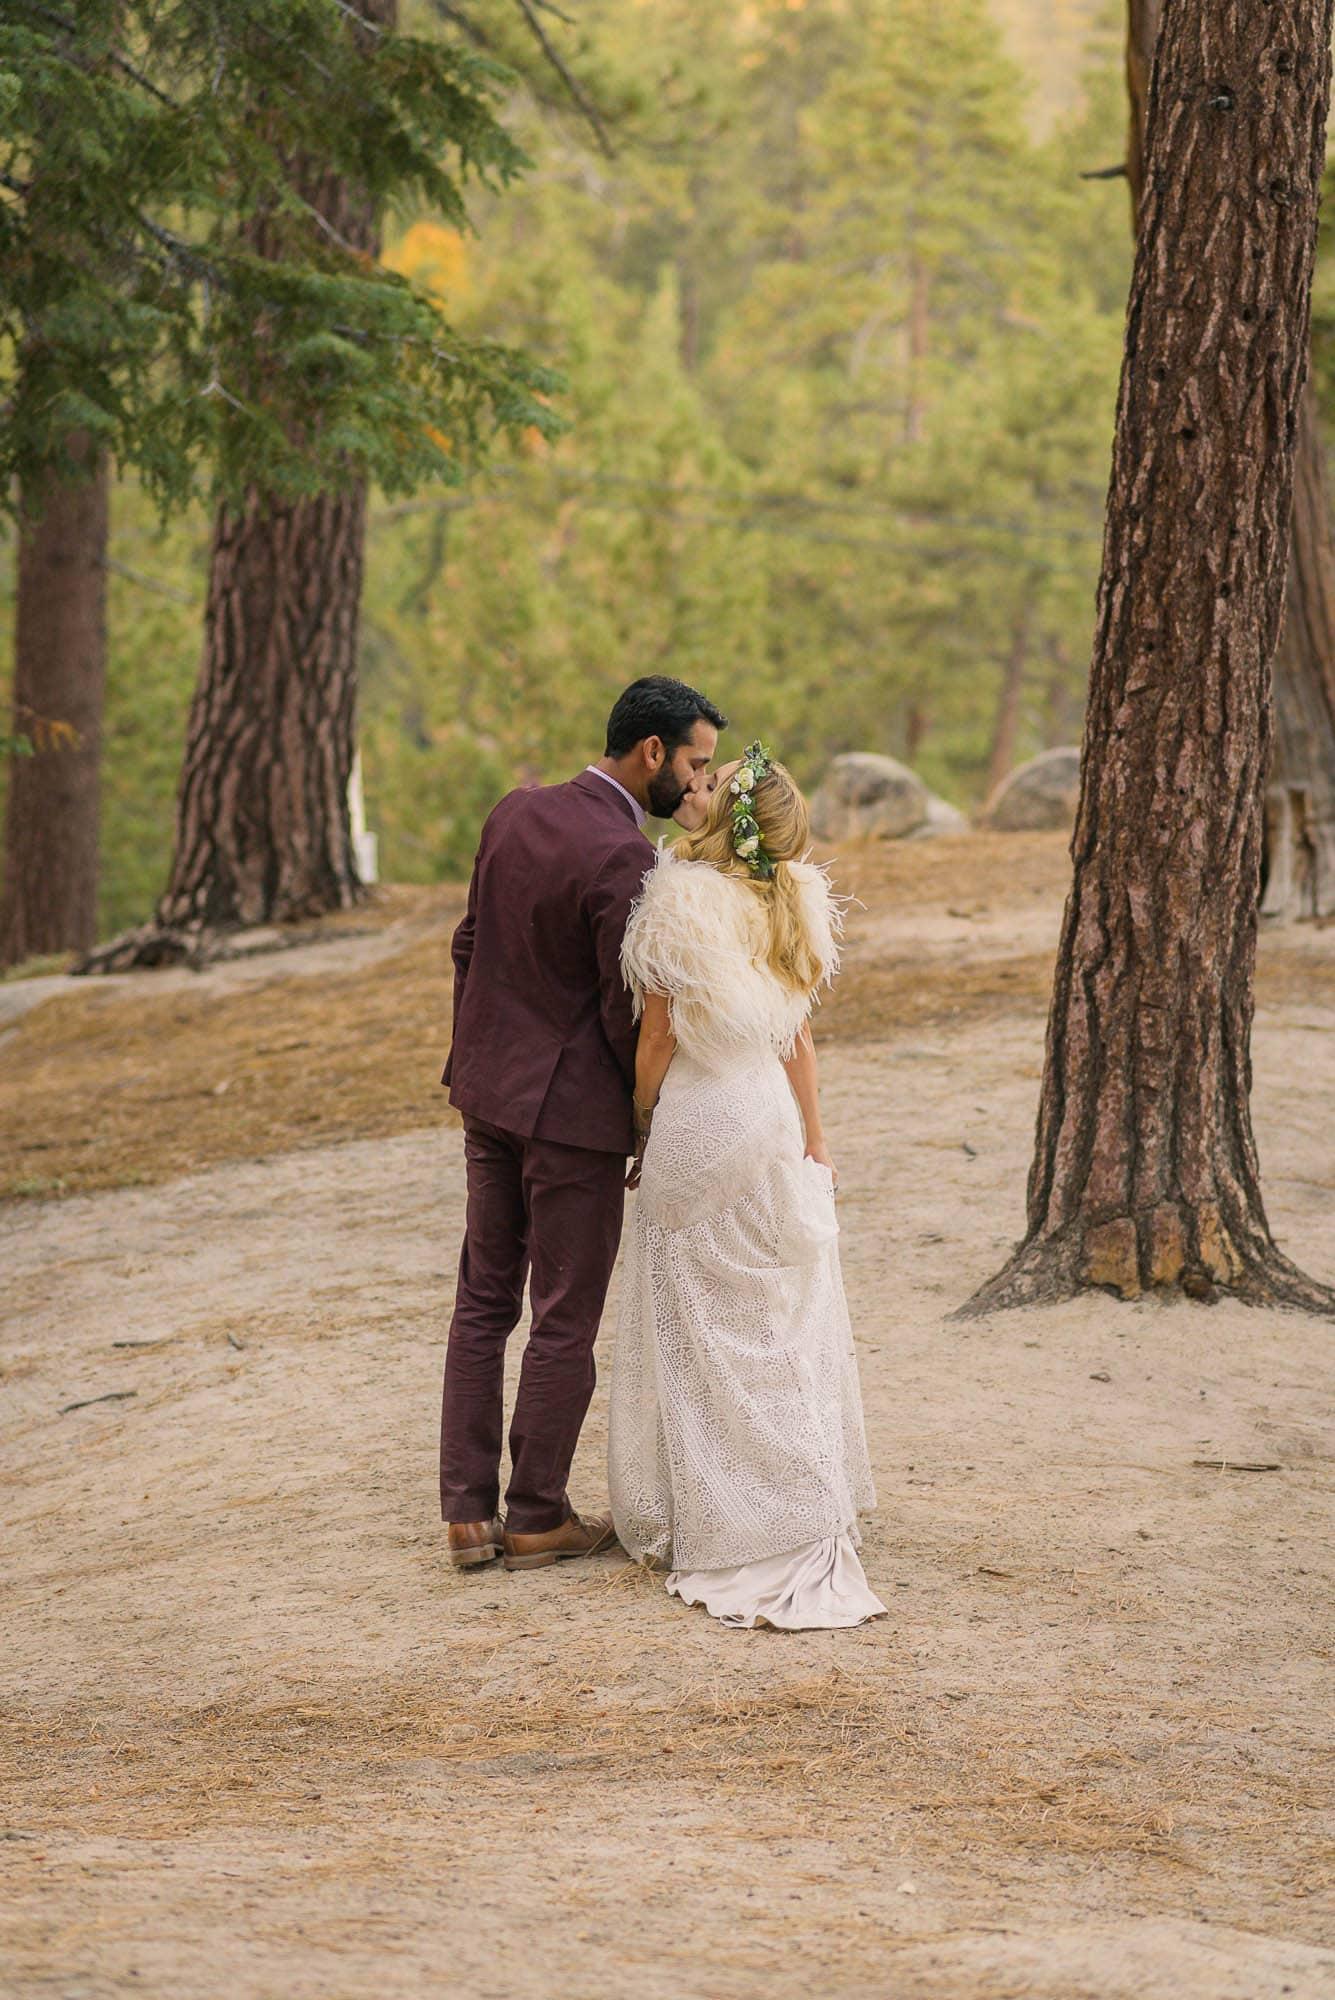 045_Alan_and_Heidi_Wedding_Natalie_Mike